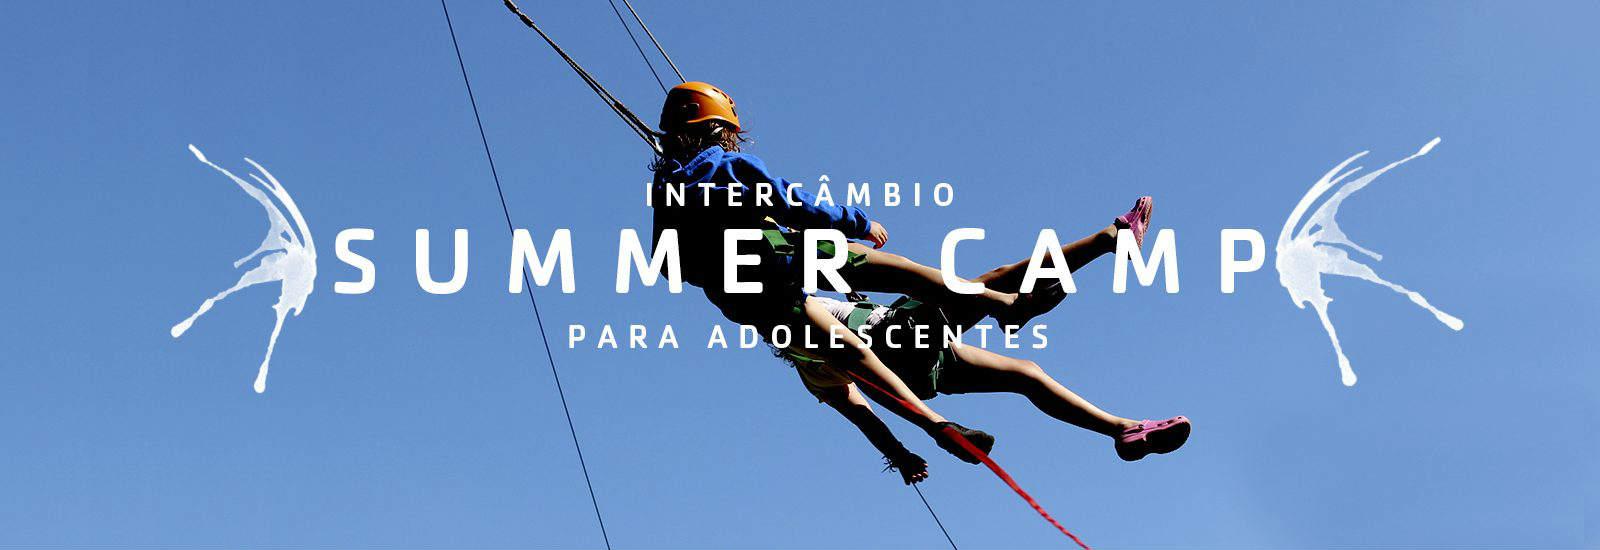 banner summer camp intercambio USA acampamento verao aventura jovens Belo horizonte Ed - Seguro Viagem